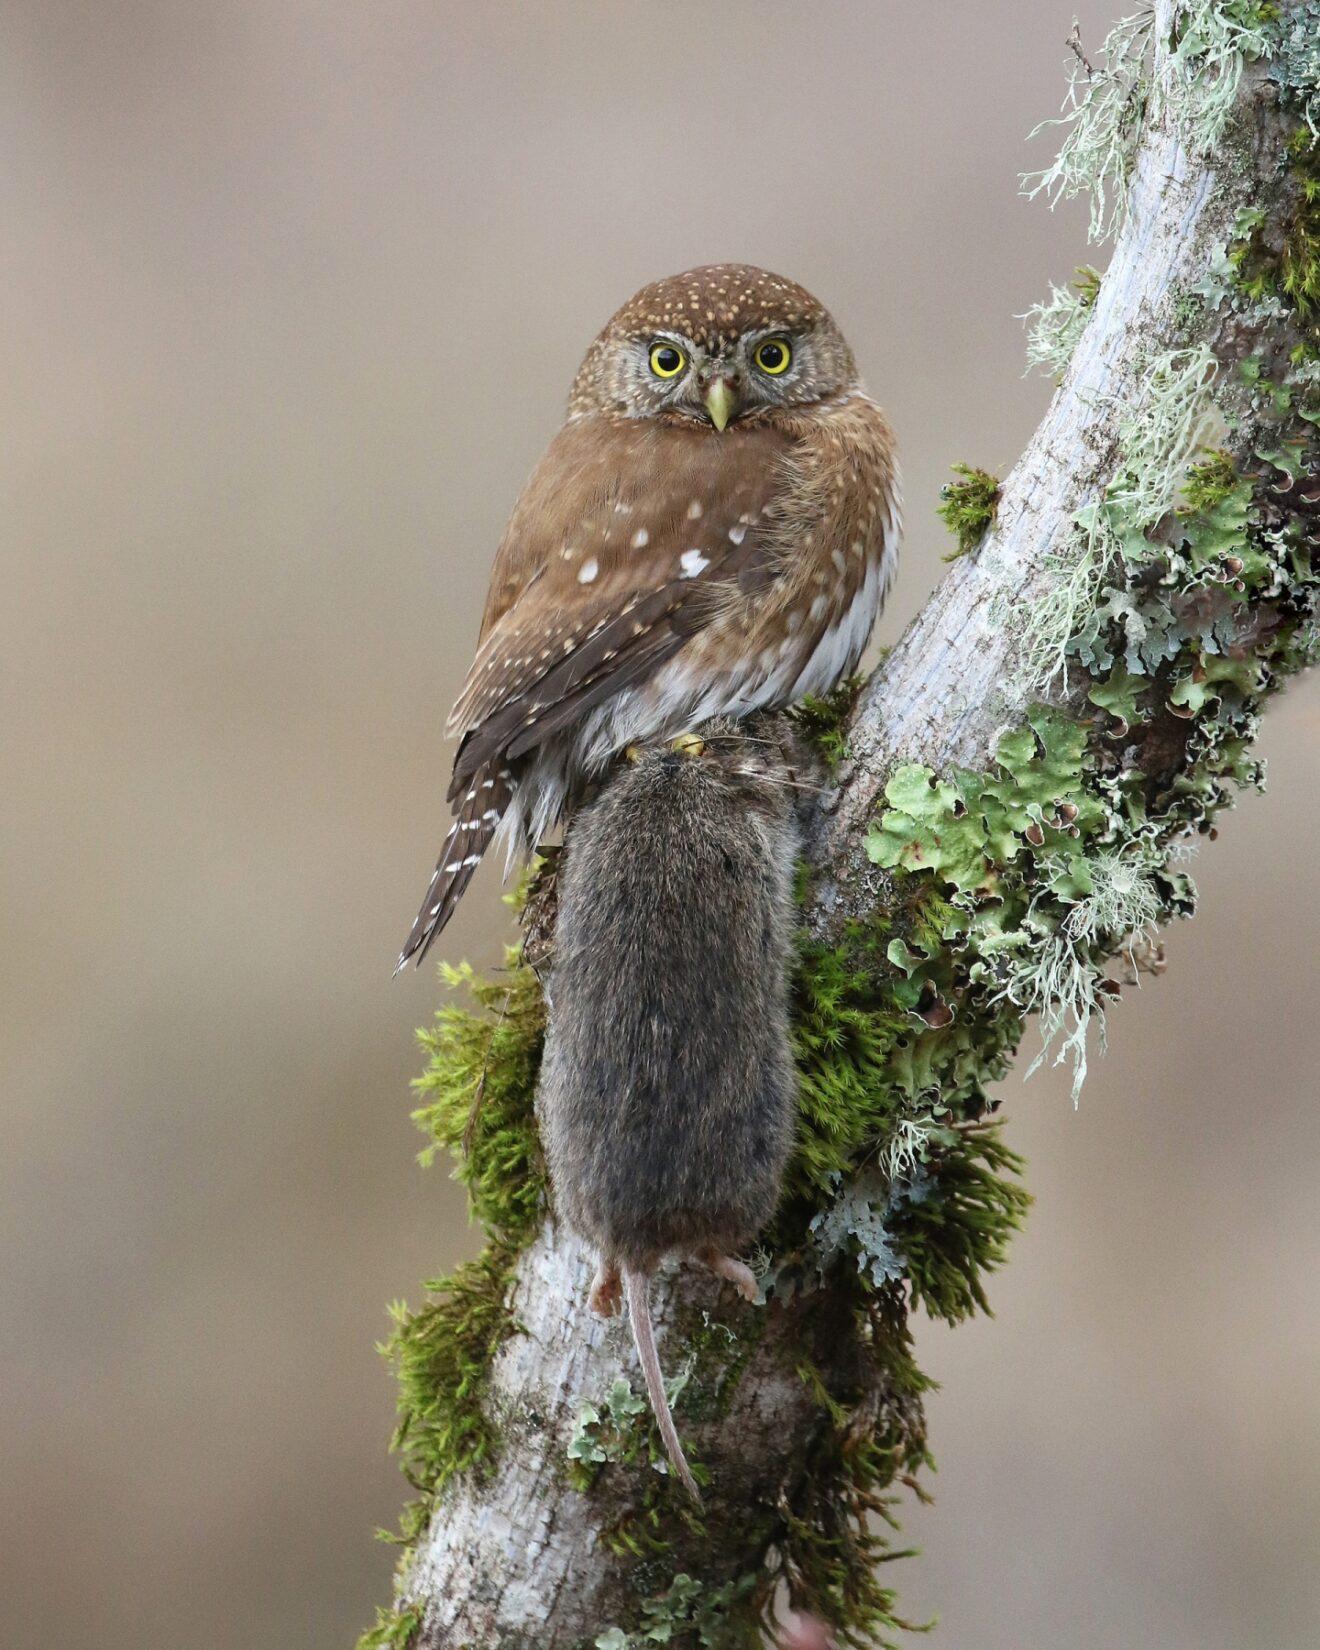 Pigmy-owl holding vole prey on lichen-covered tree branch